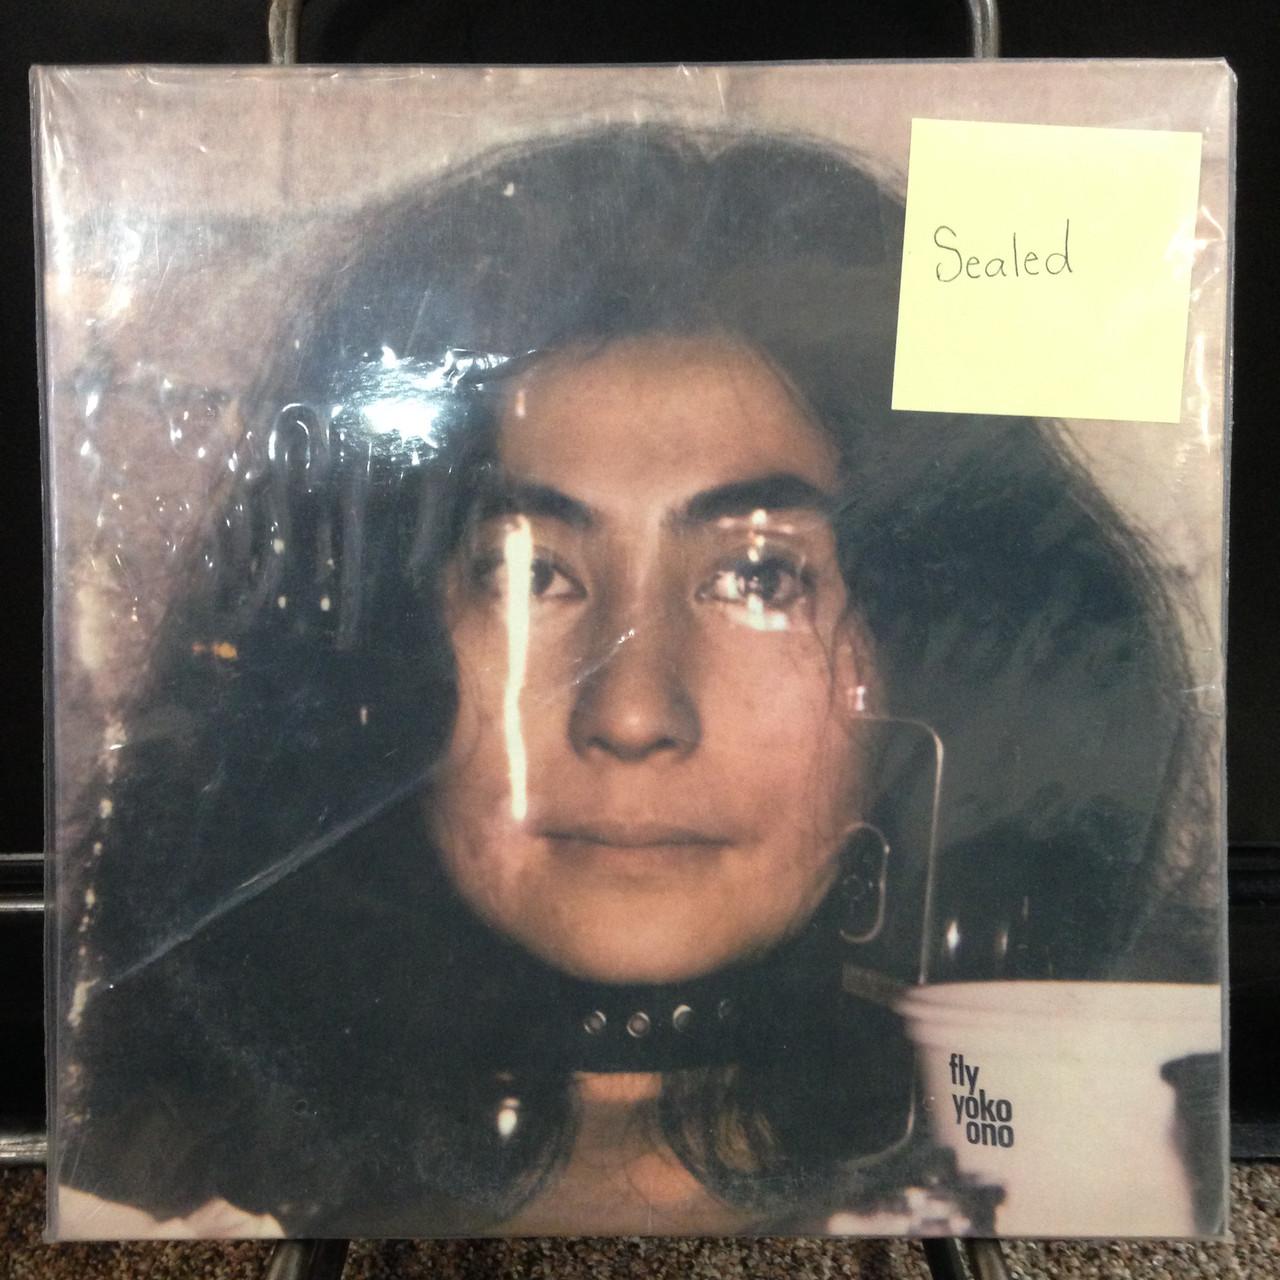 Yoko Ono Fly Apple Svbb 3380 Sealed 2 Lp Vinyl Renaissance And Audio